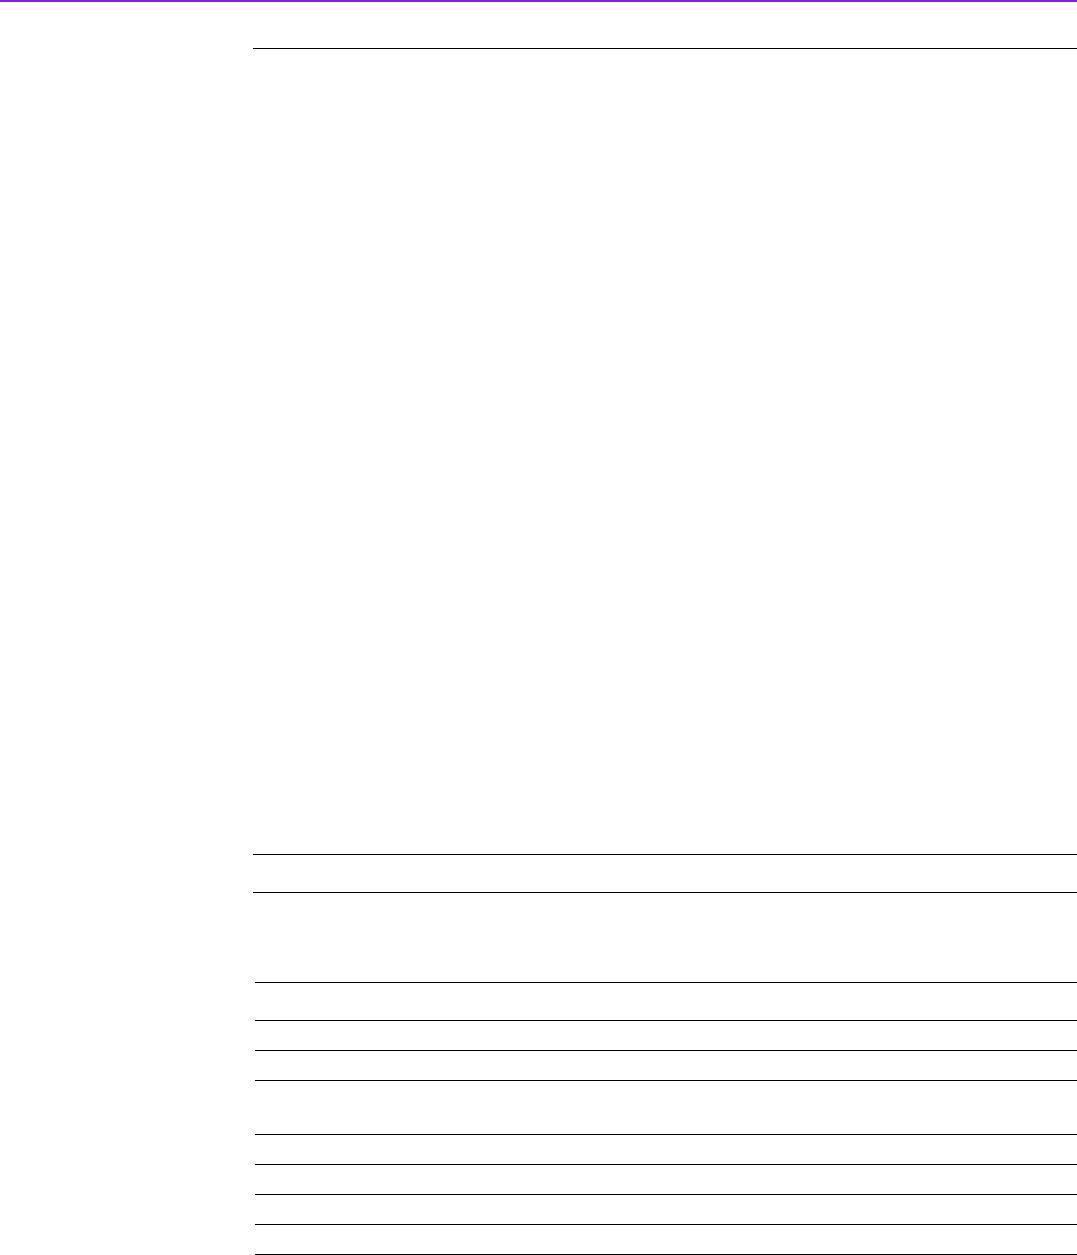 Advantech ARK-2150 User Manual Download - 1 3 2 iManager